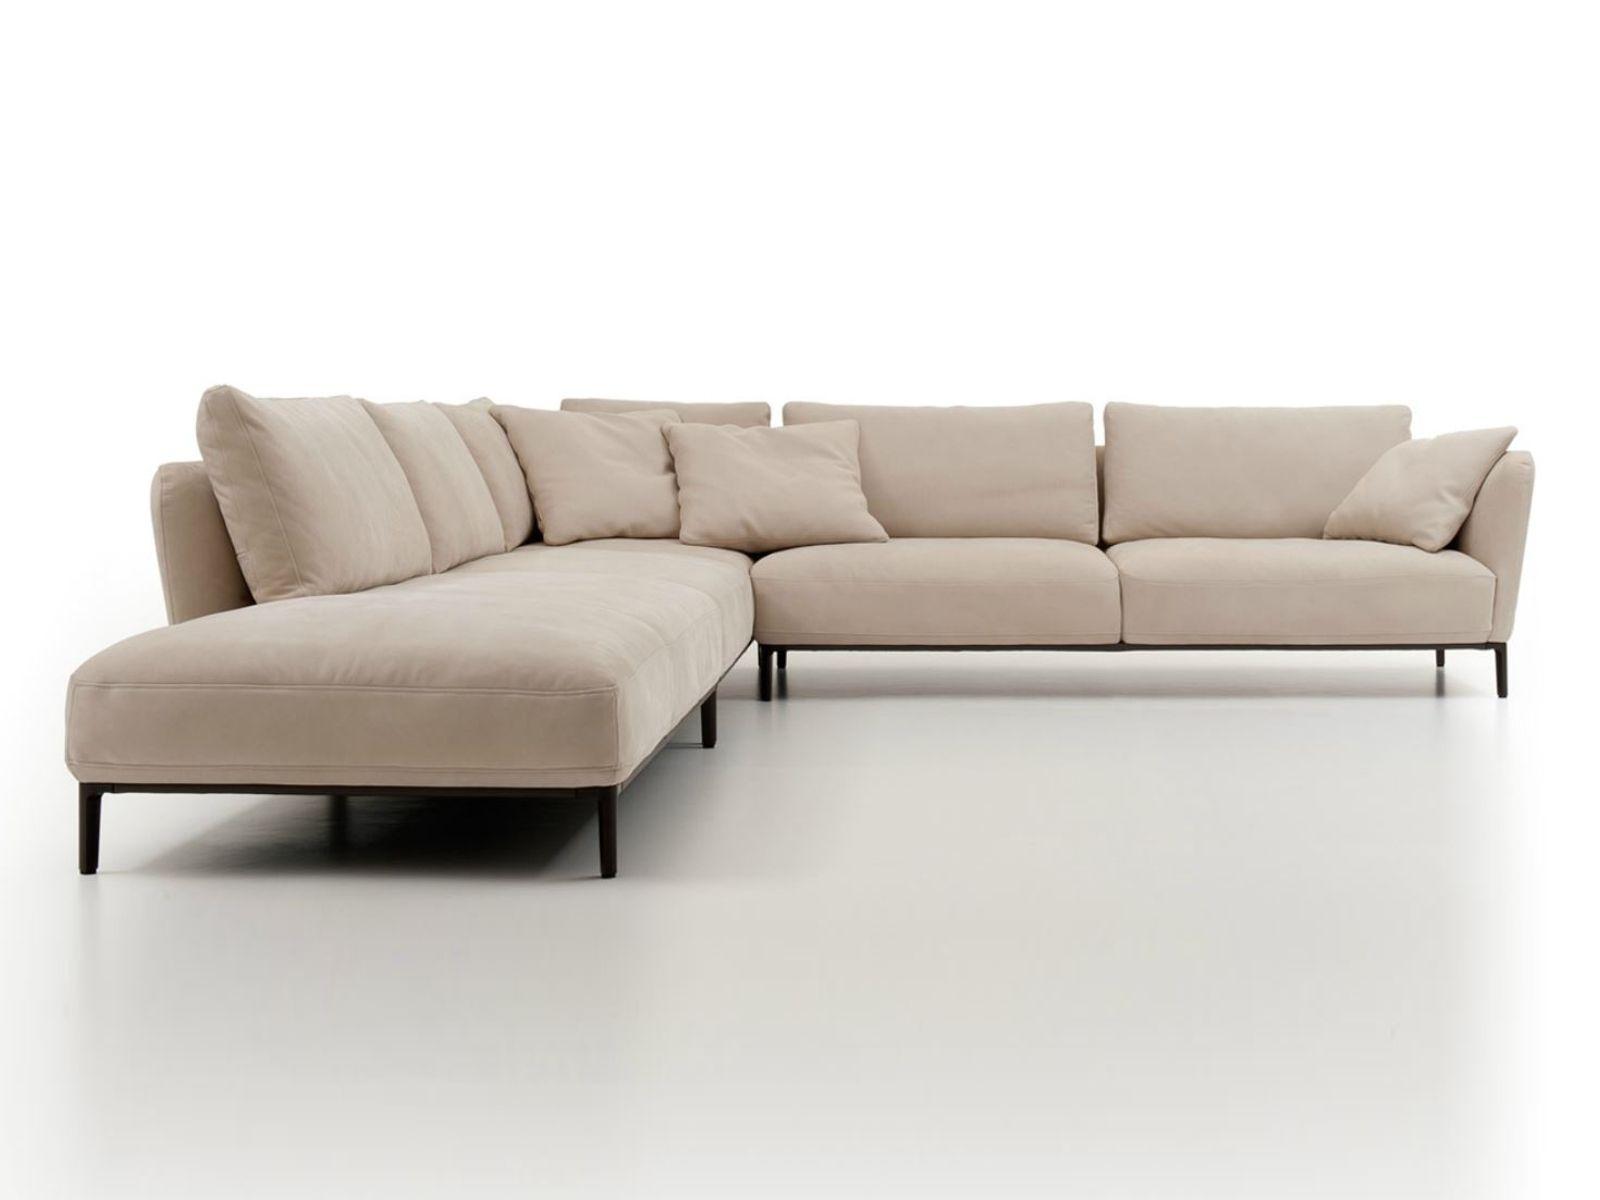 scala corner sofa by rolf benz design gino carollo. Black Bedroom Furniture Sets. Home Design Ideas